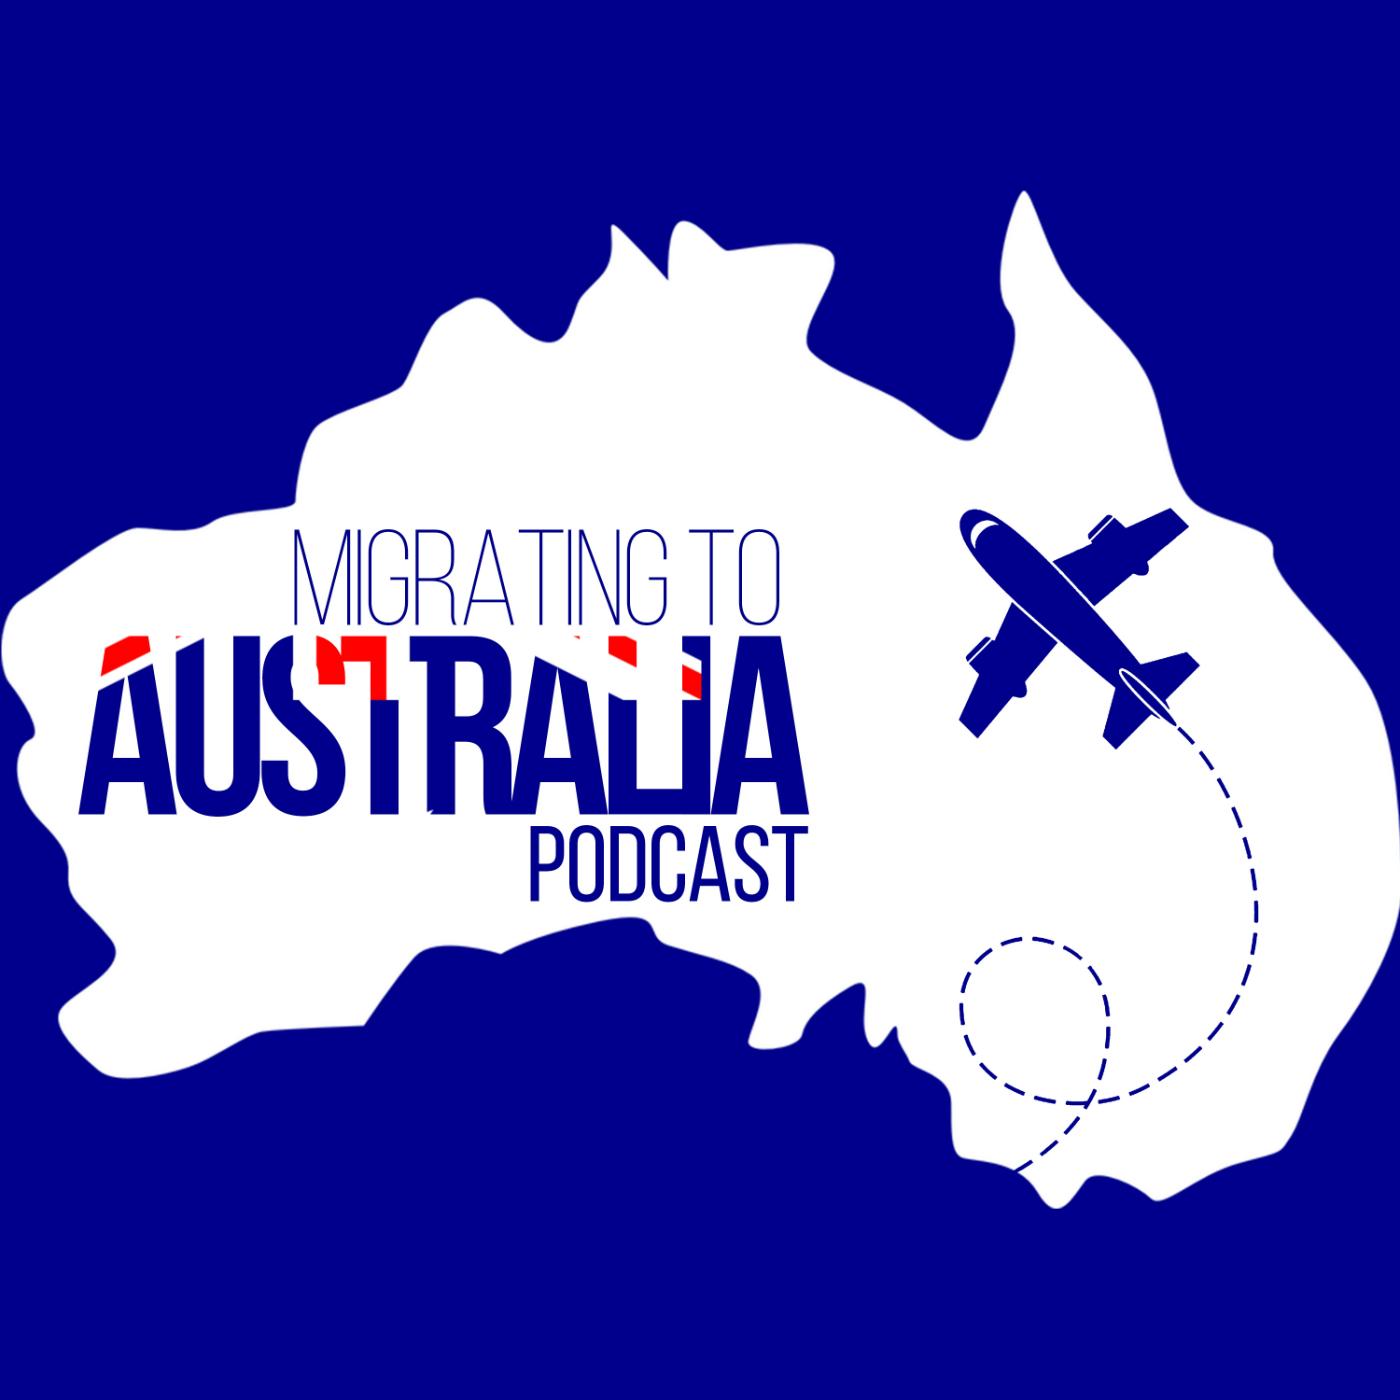 Migrating To Australia Podcast show art